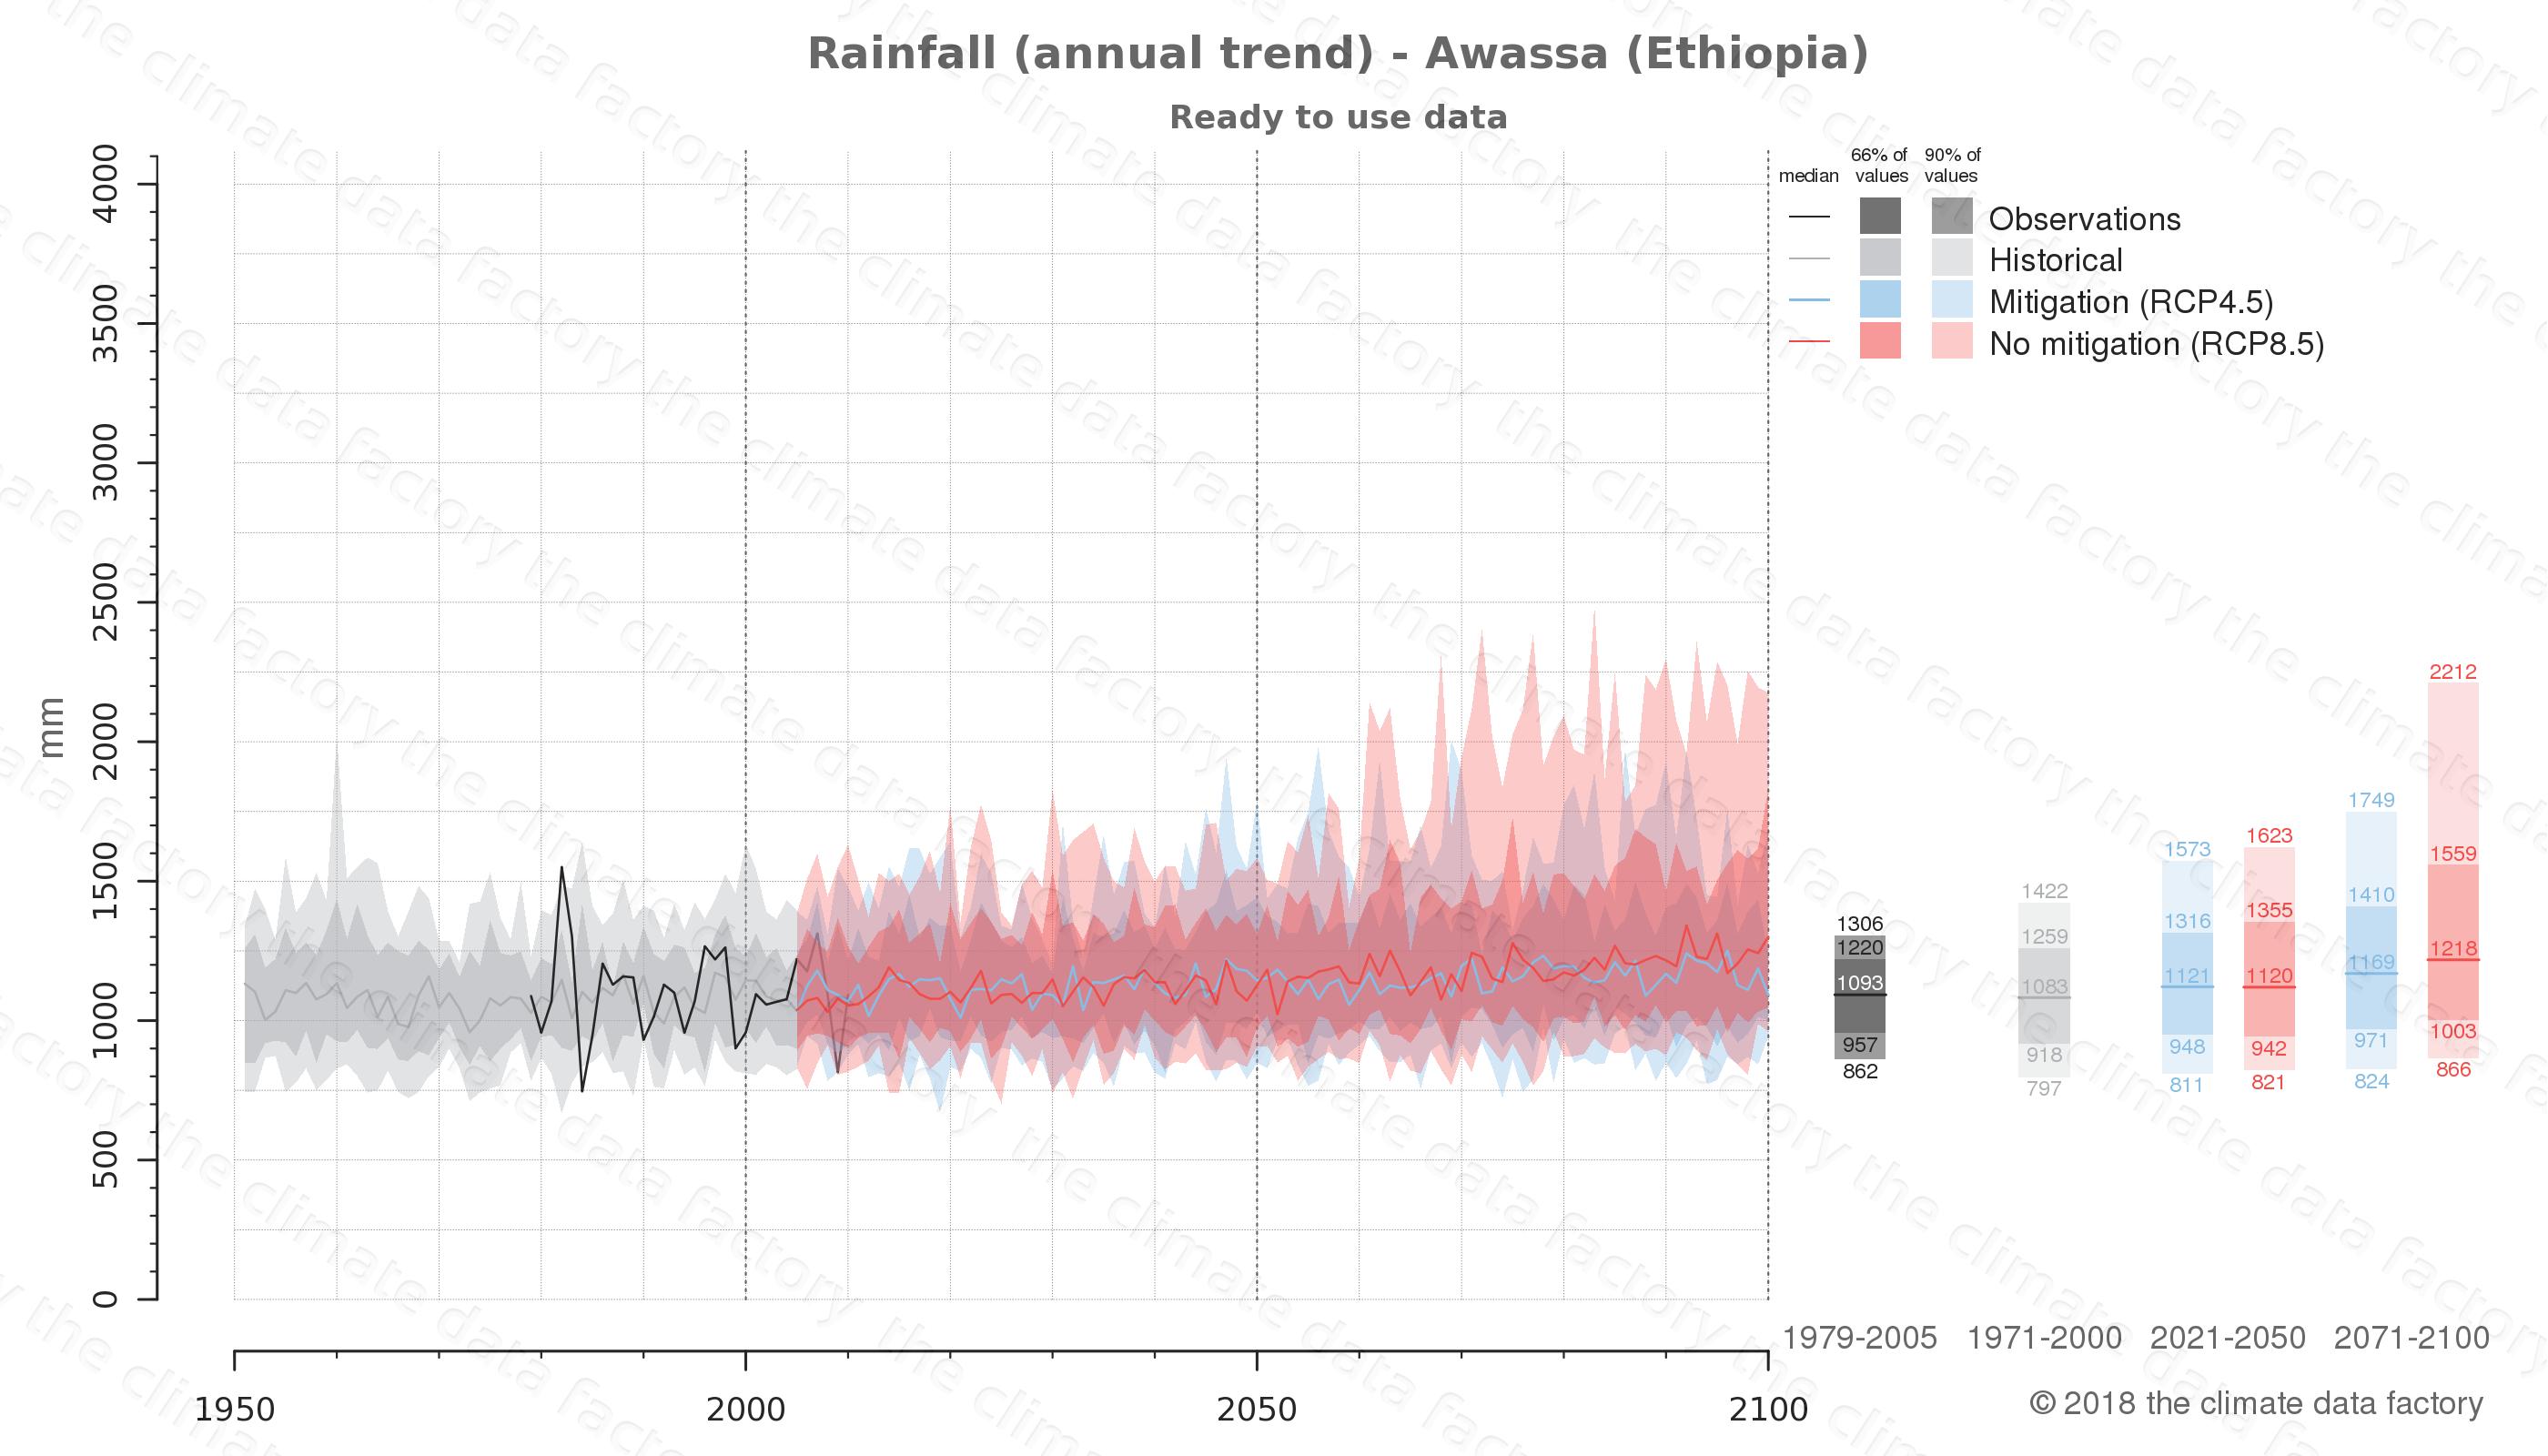 climate change data policy adaptation climate graph city data rainfall awassa ethiopia